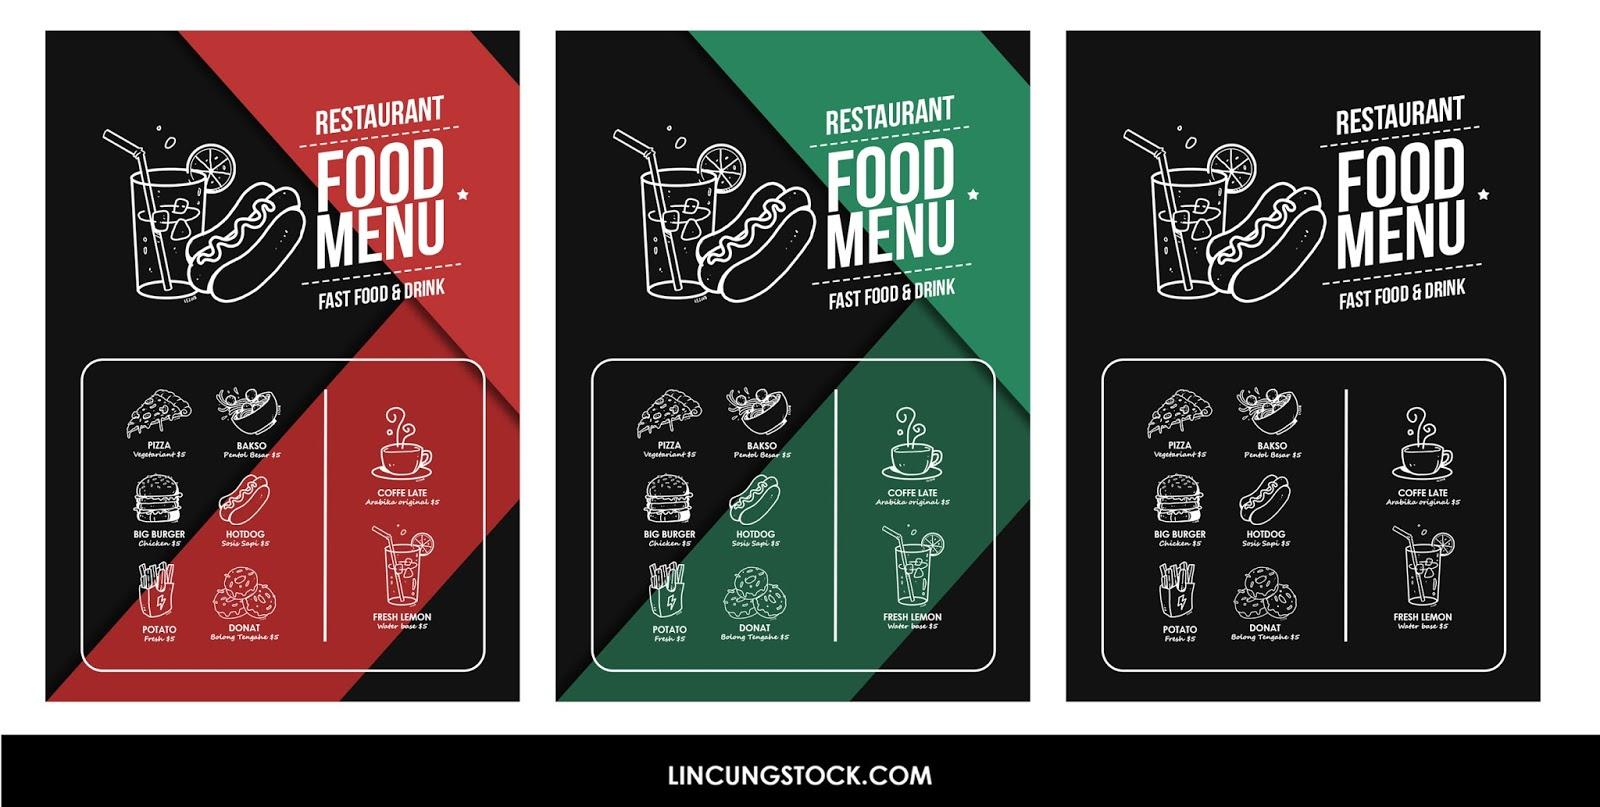 Free Download Hand Drawn Food Menu Template Psd File